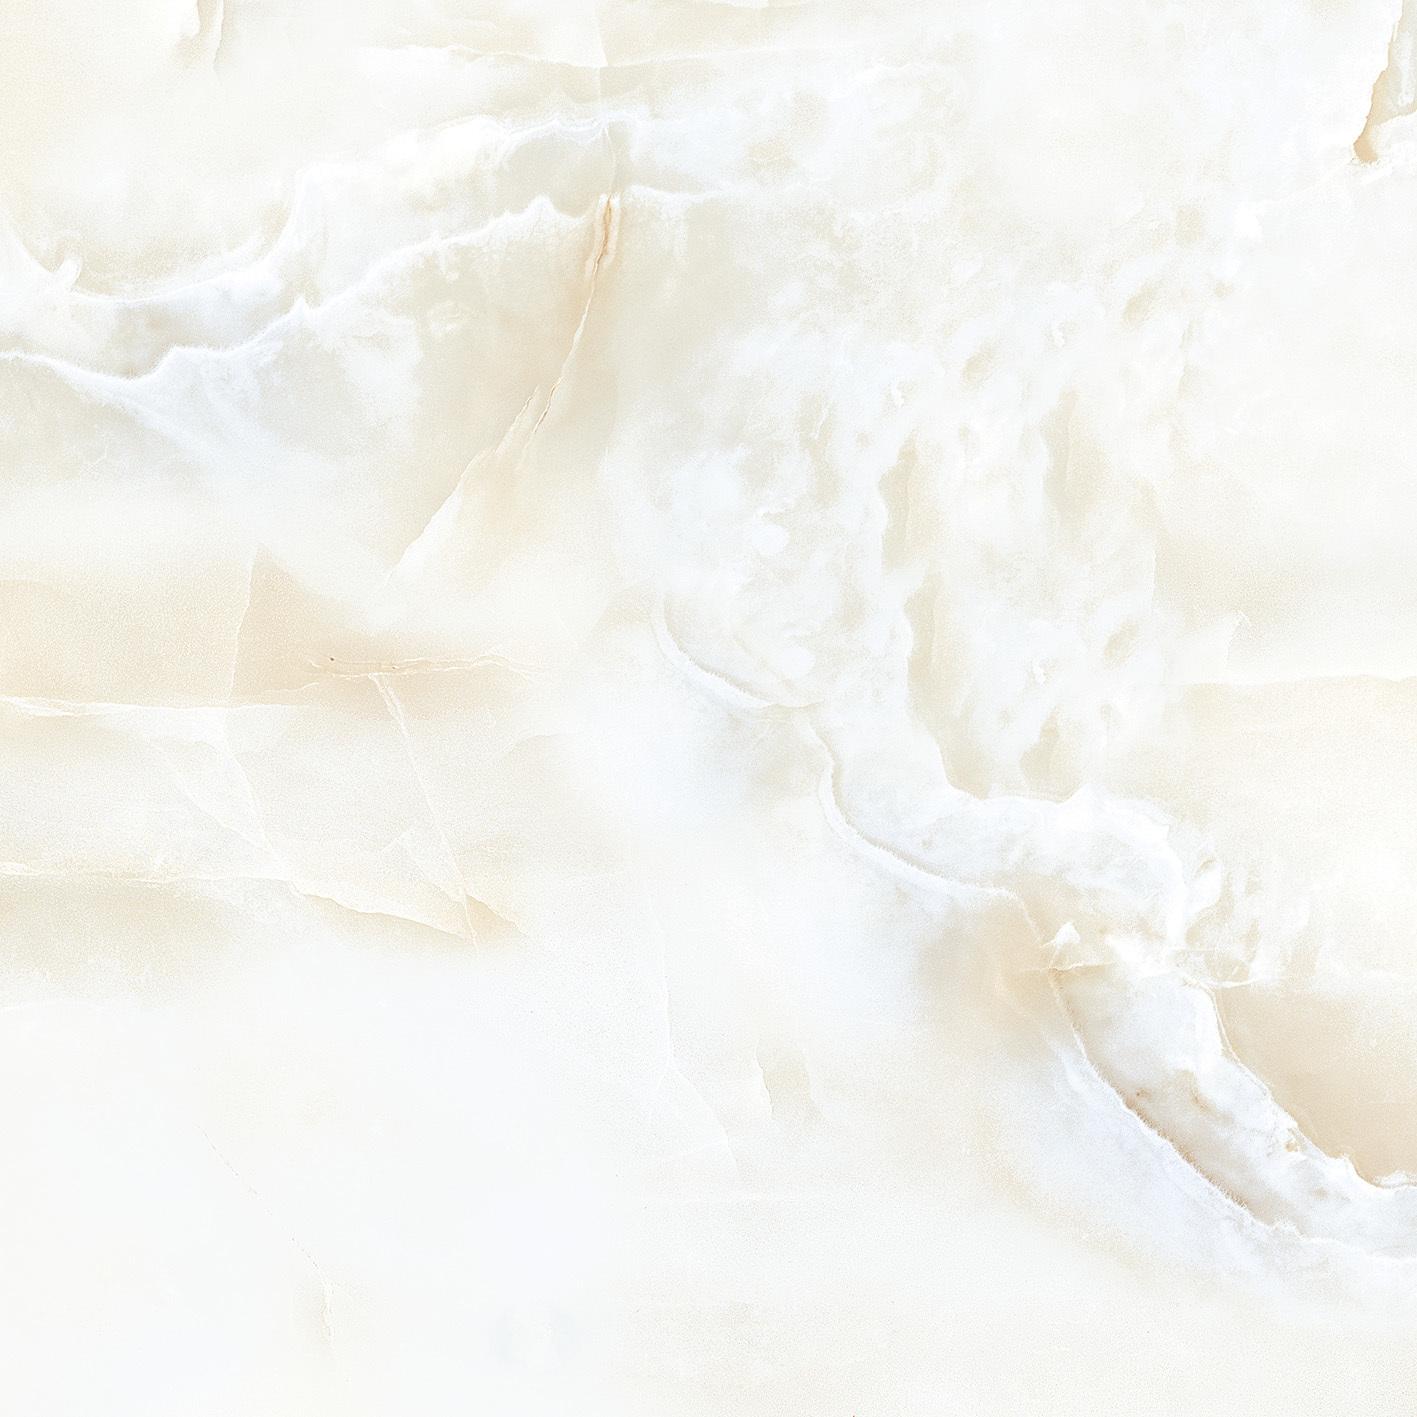 ANELISSE BIANCO 600x600 mm GLOSSY PORCELAIN TILES